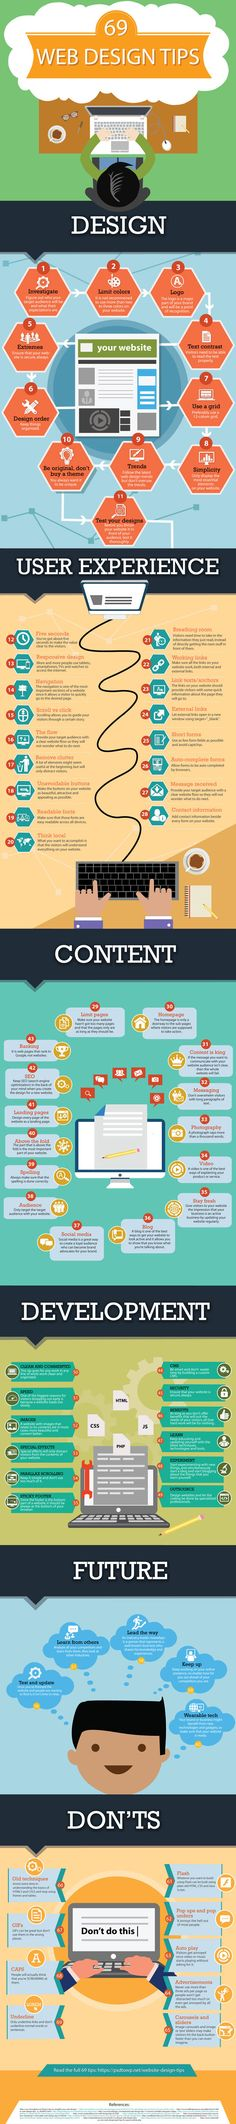 69 web design tips #infographic